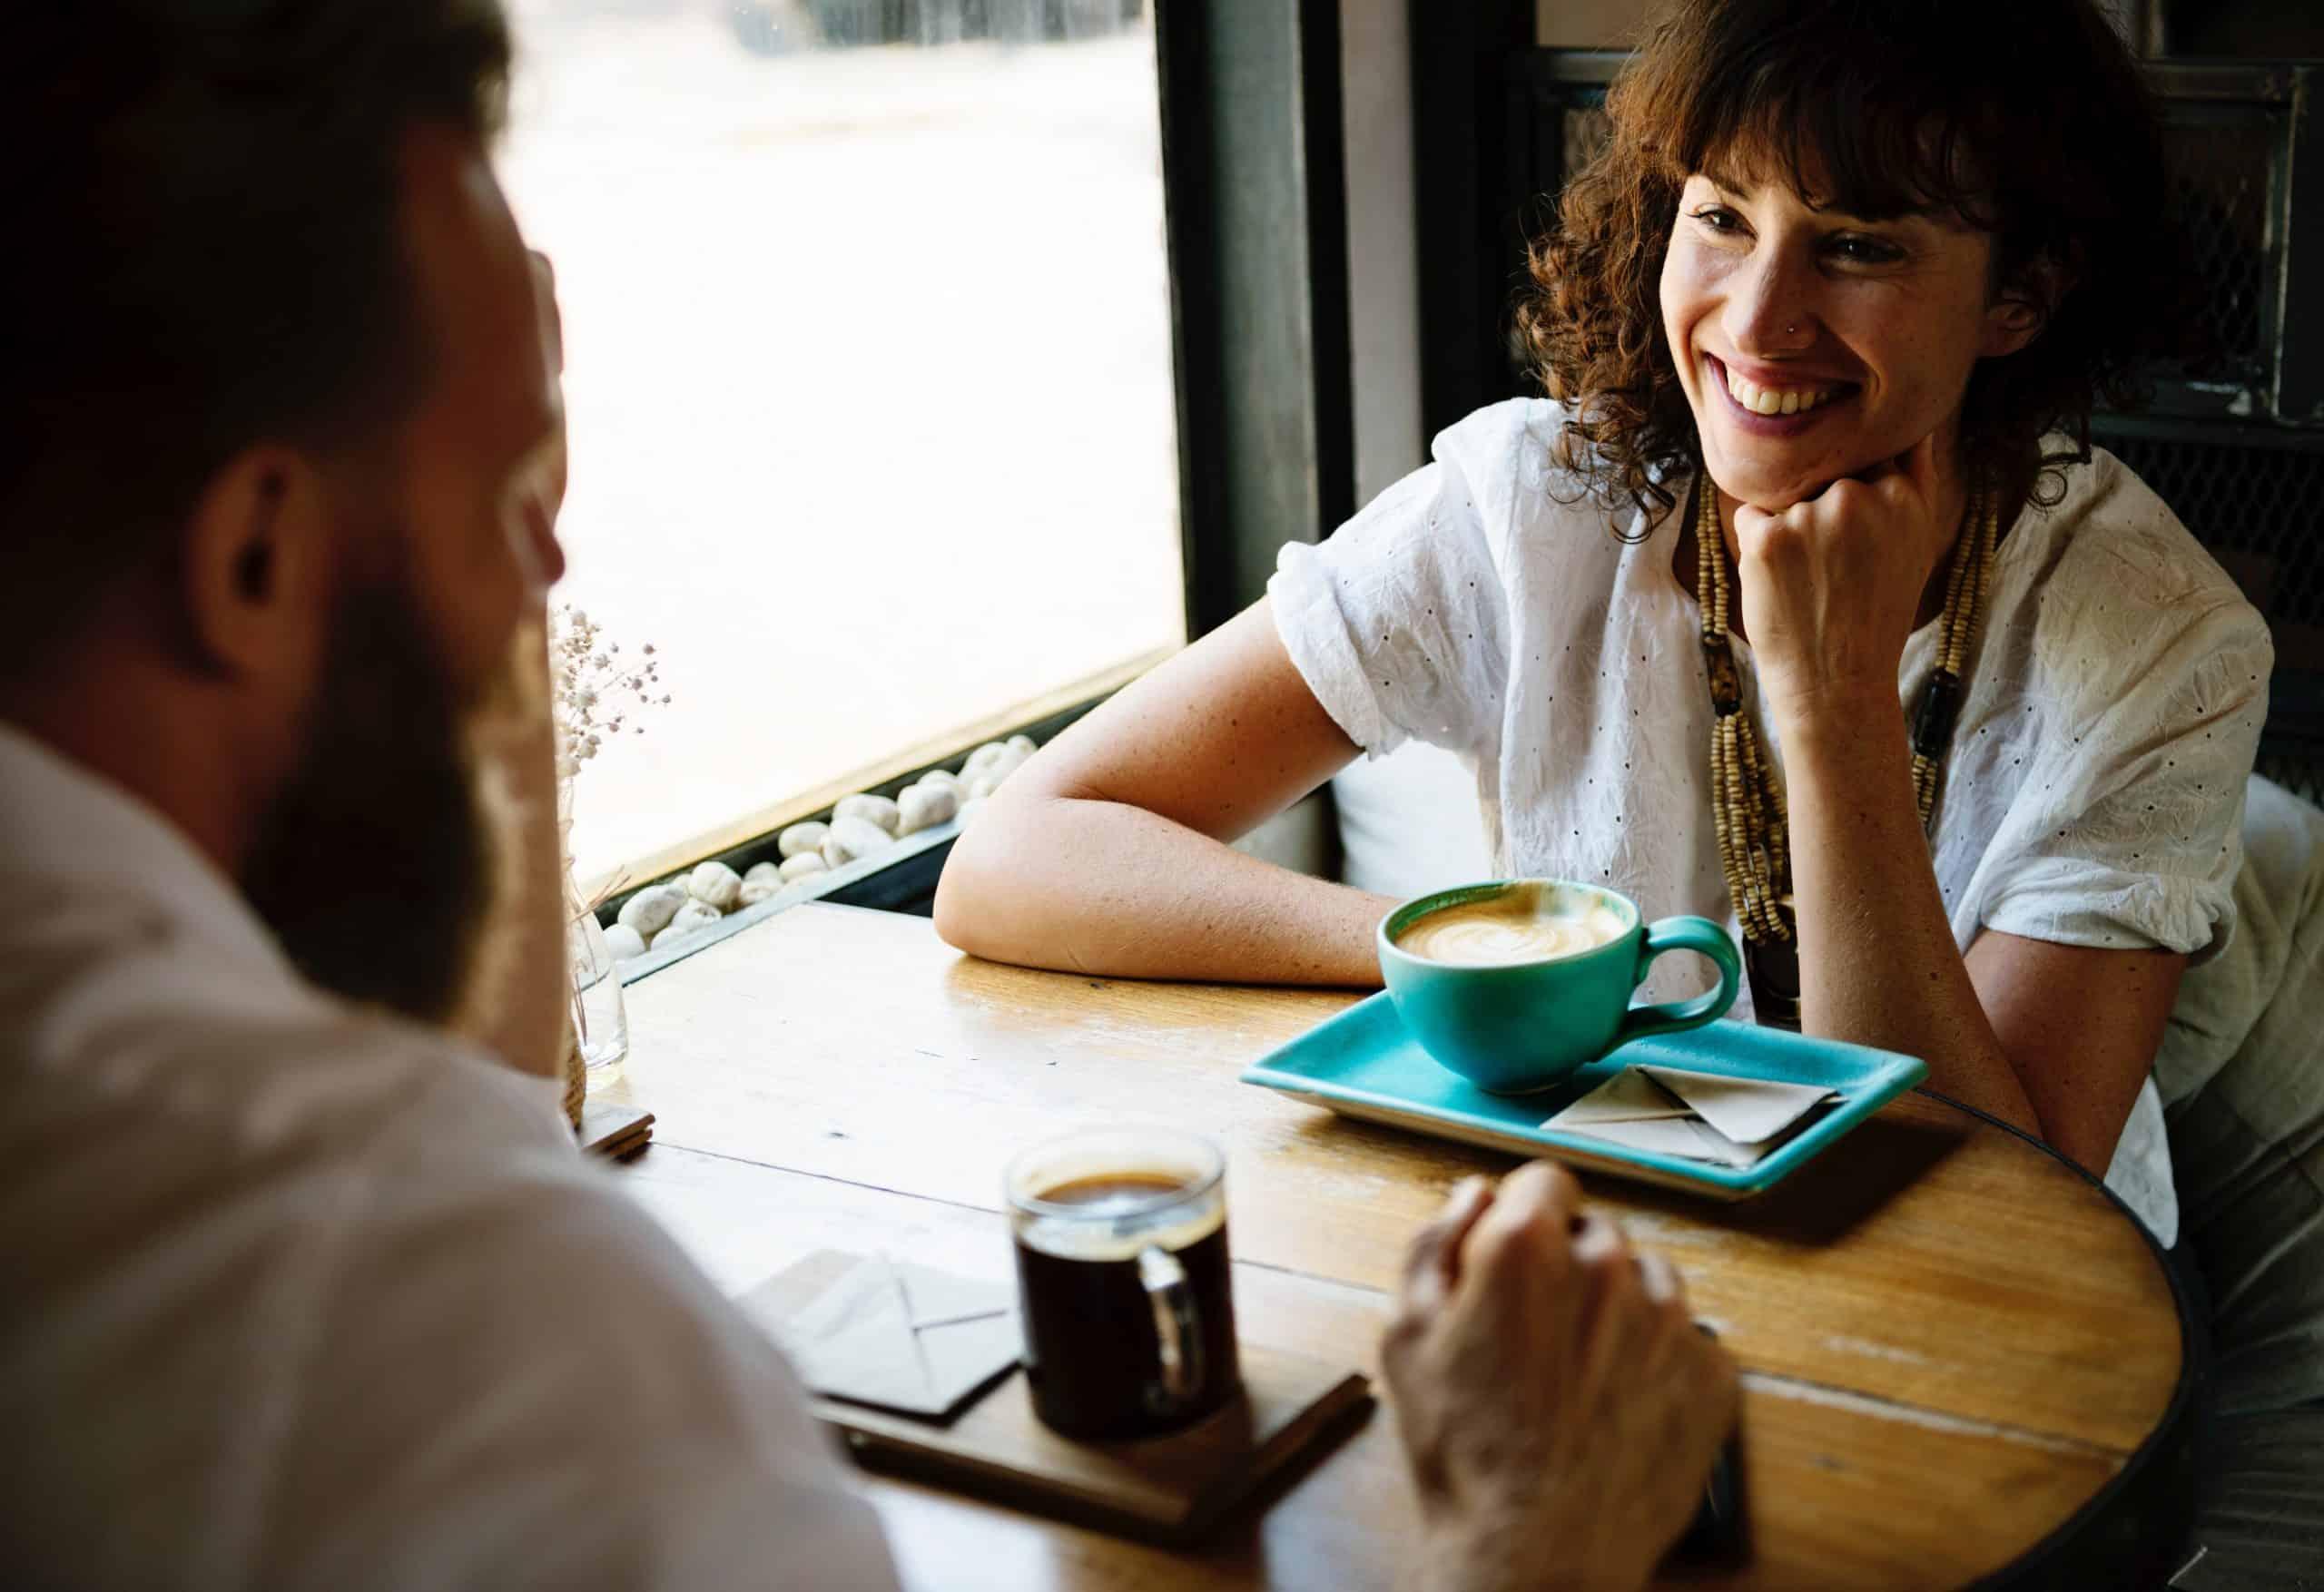 Communication & Positive Mindset